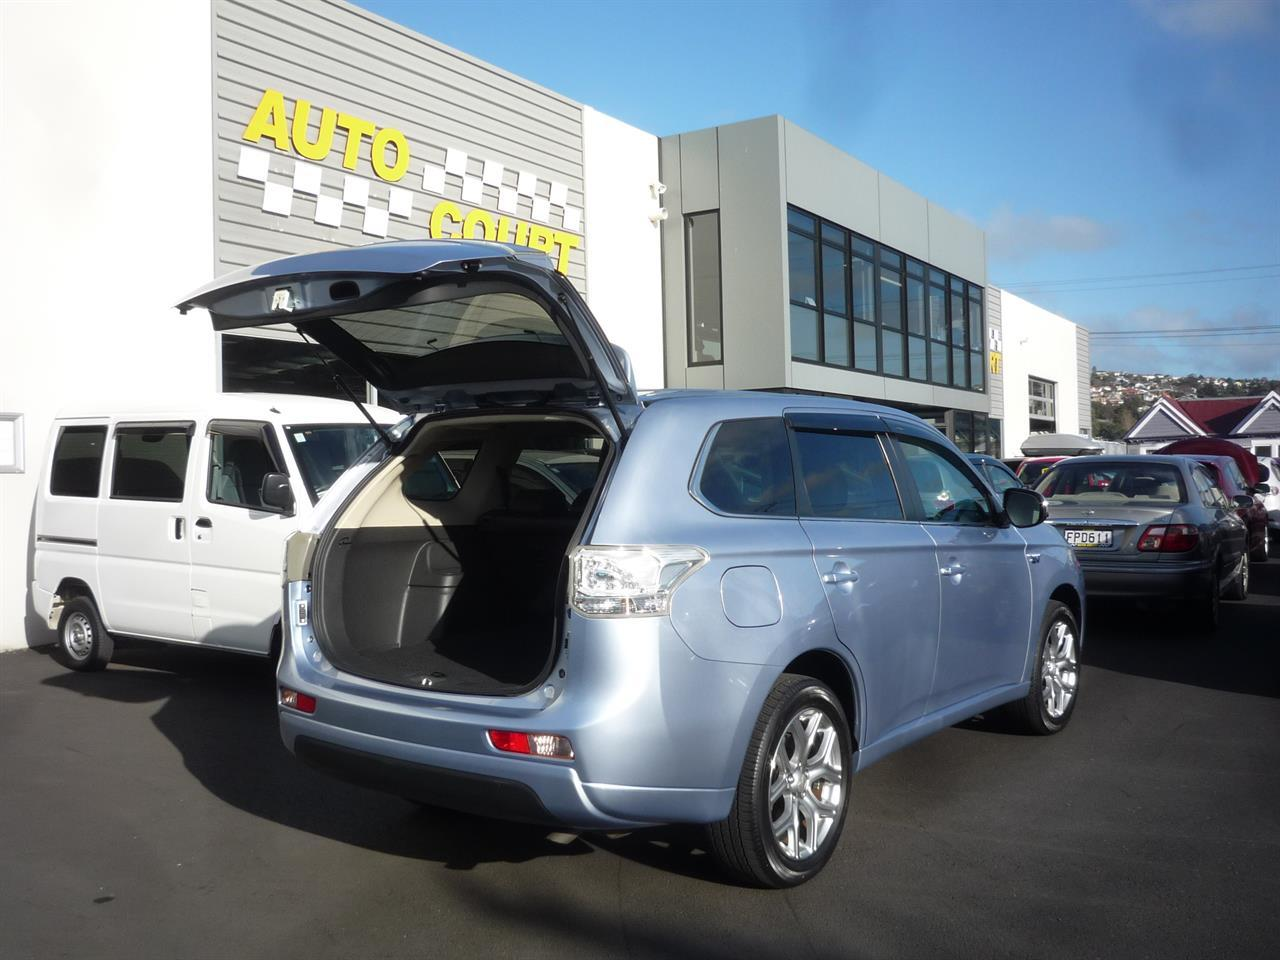 image-14, 2015 Mitsubishi Outlander PHEV G 4WD at Dunedin